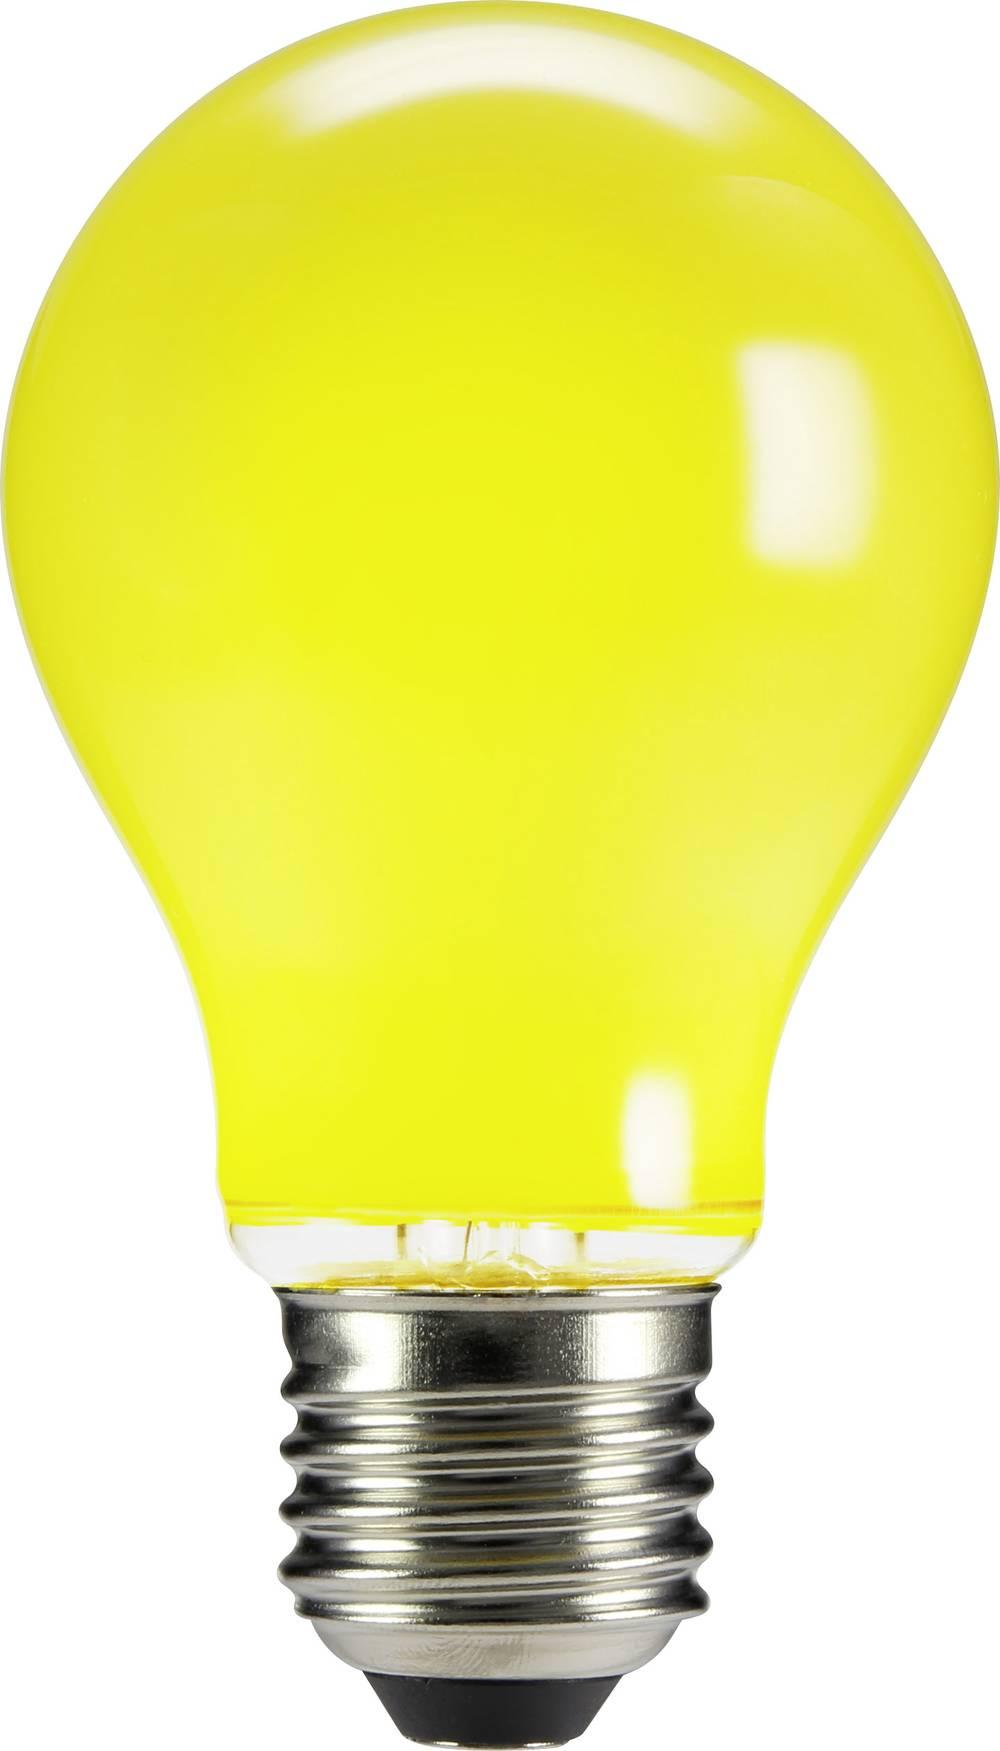 LED žarnica E27 klasična oblika 4 W rumena (premer x D) 60 mm x 105 mm EEK: n.rel. Sygonix filament 1 kos